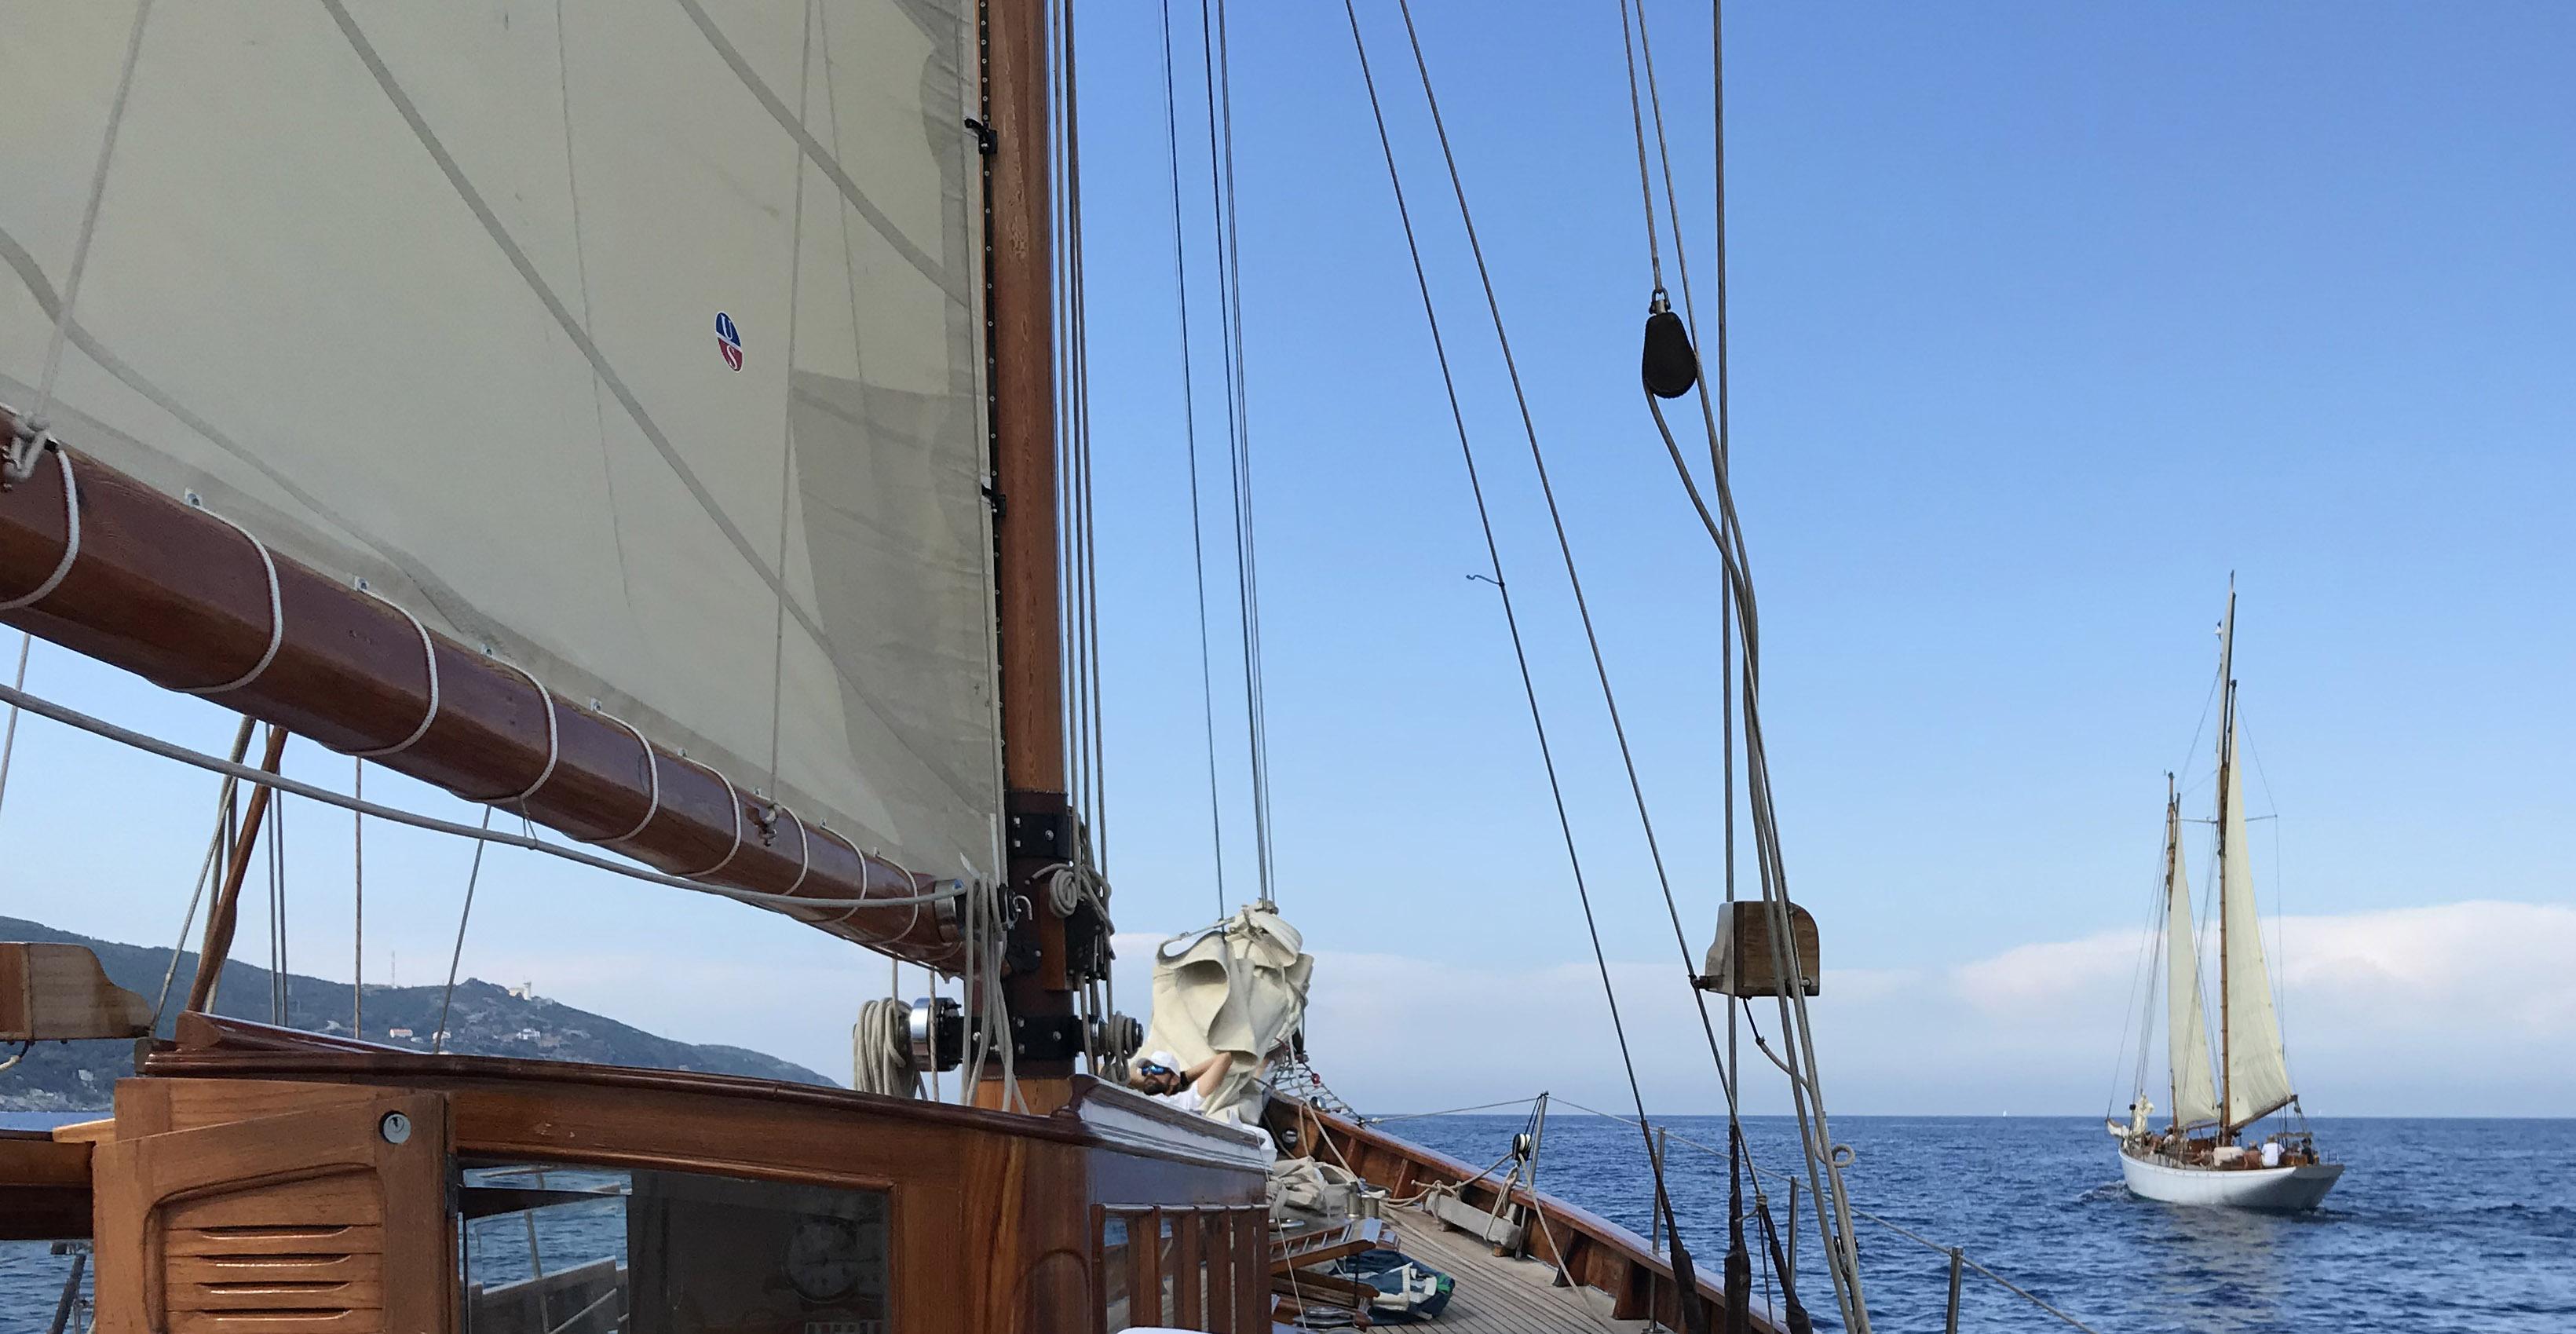 CC 2019 SY Hygie x SY Morwenna Bastia Vieux Port - Macinaggio vendredi 30 août photo Thibaud Assante DR